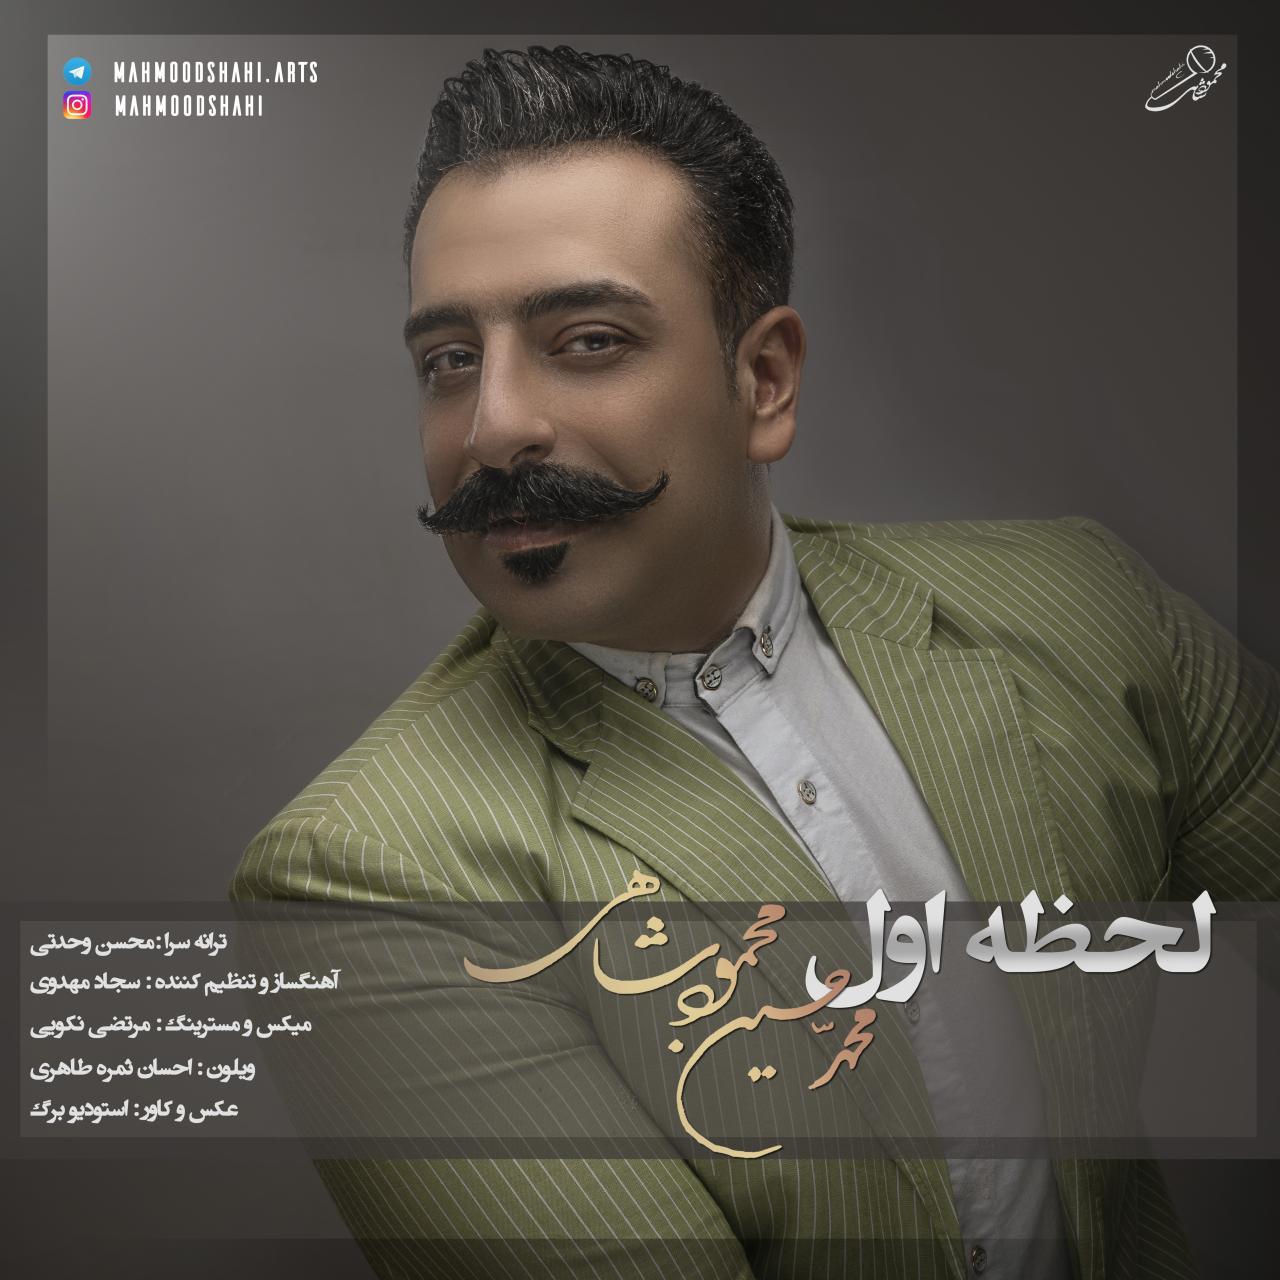 Mahmoodshahi – Lahze Aval